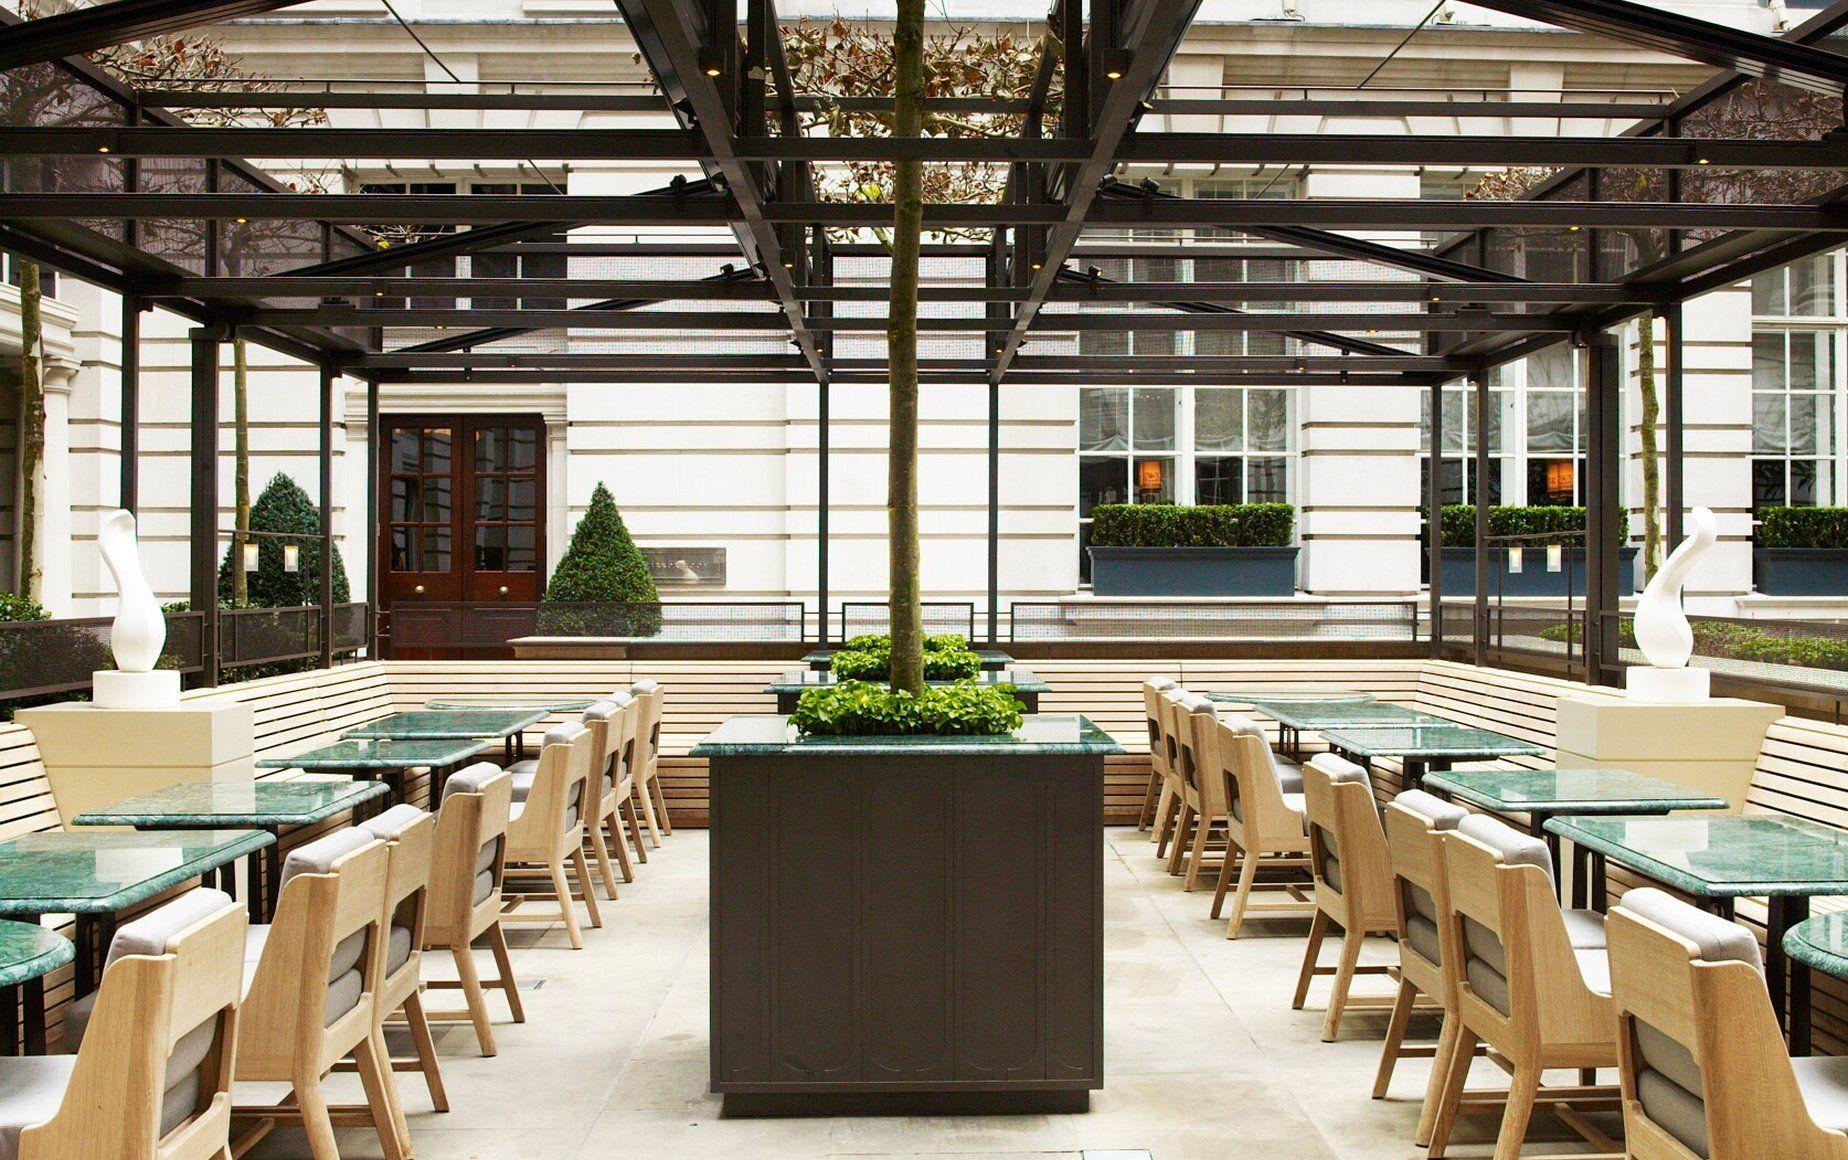 Rosewood Hotel London Terrace Rosewood London Outdoor Restaurant Patio Courtyard Design